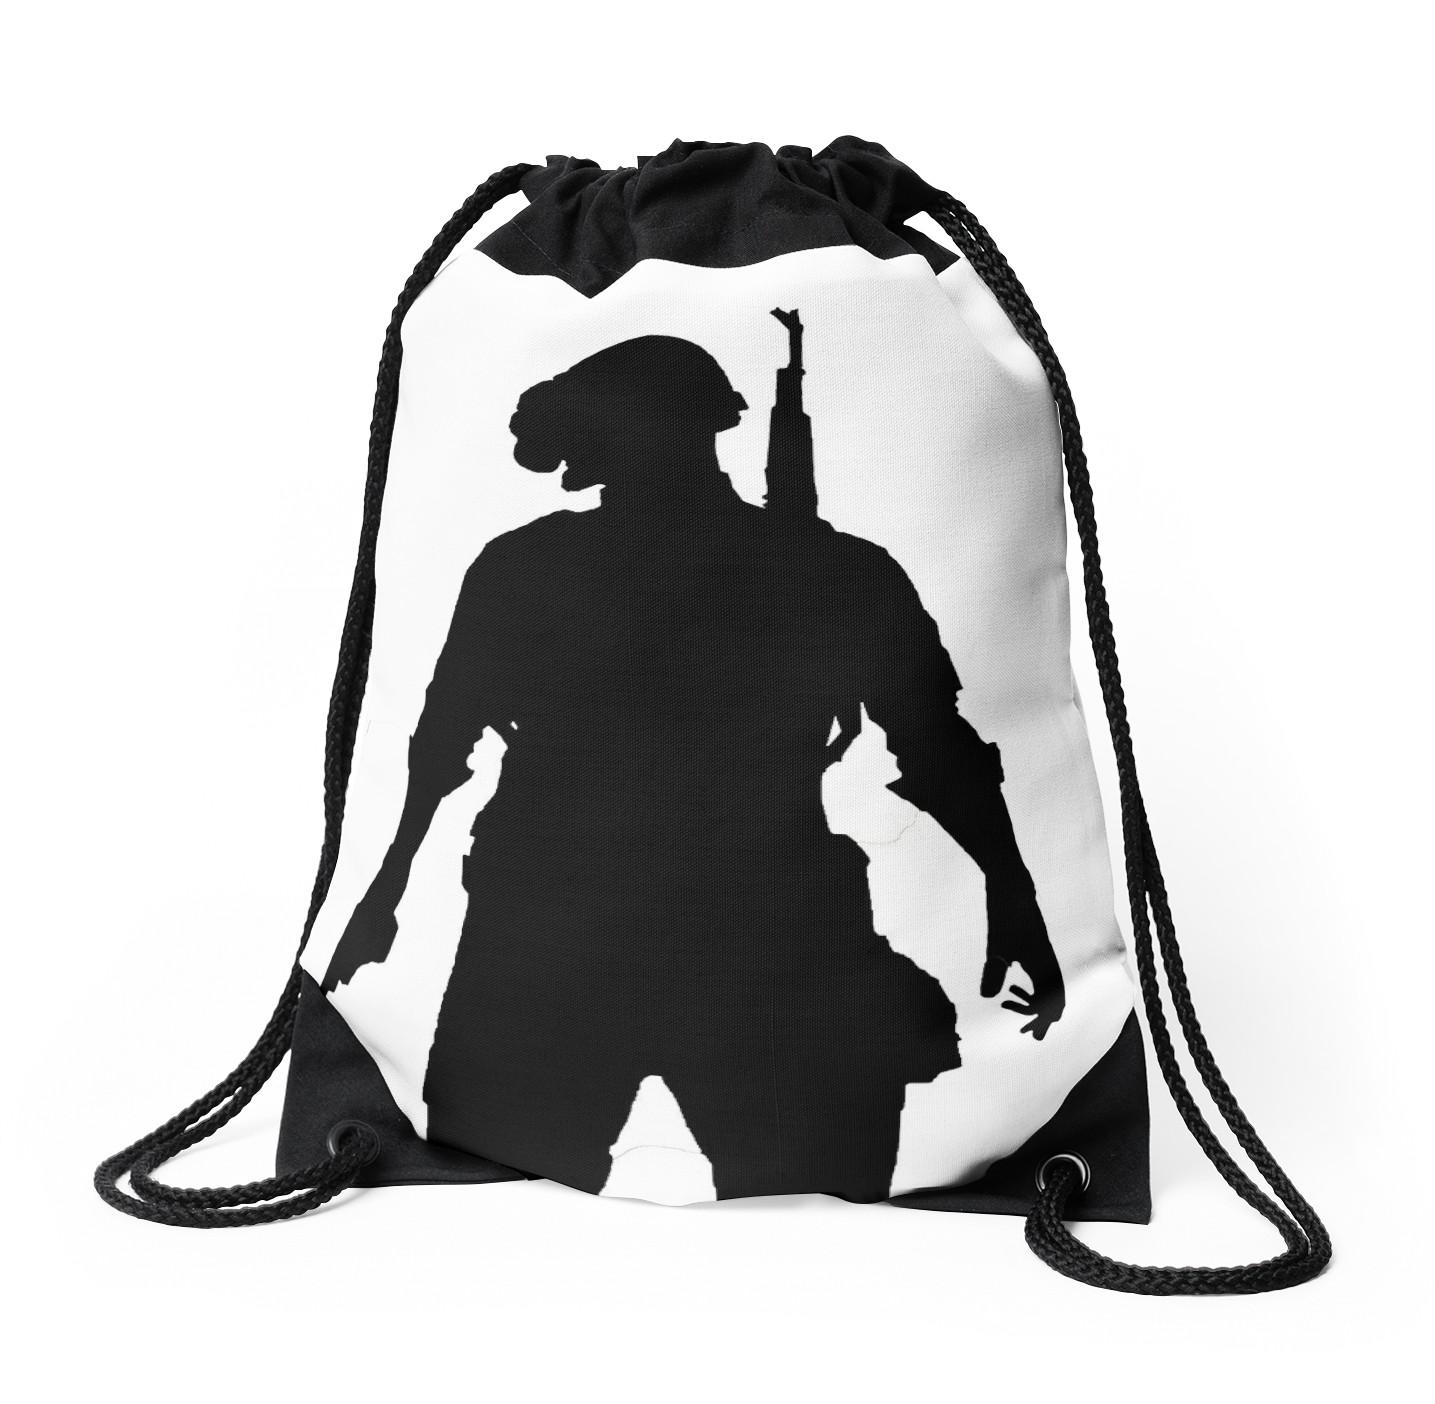 1435x1404 Pubg Silhouette Drawstring Bags By Jillianlamanna Redbubble